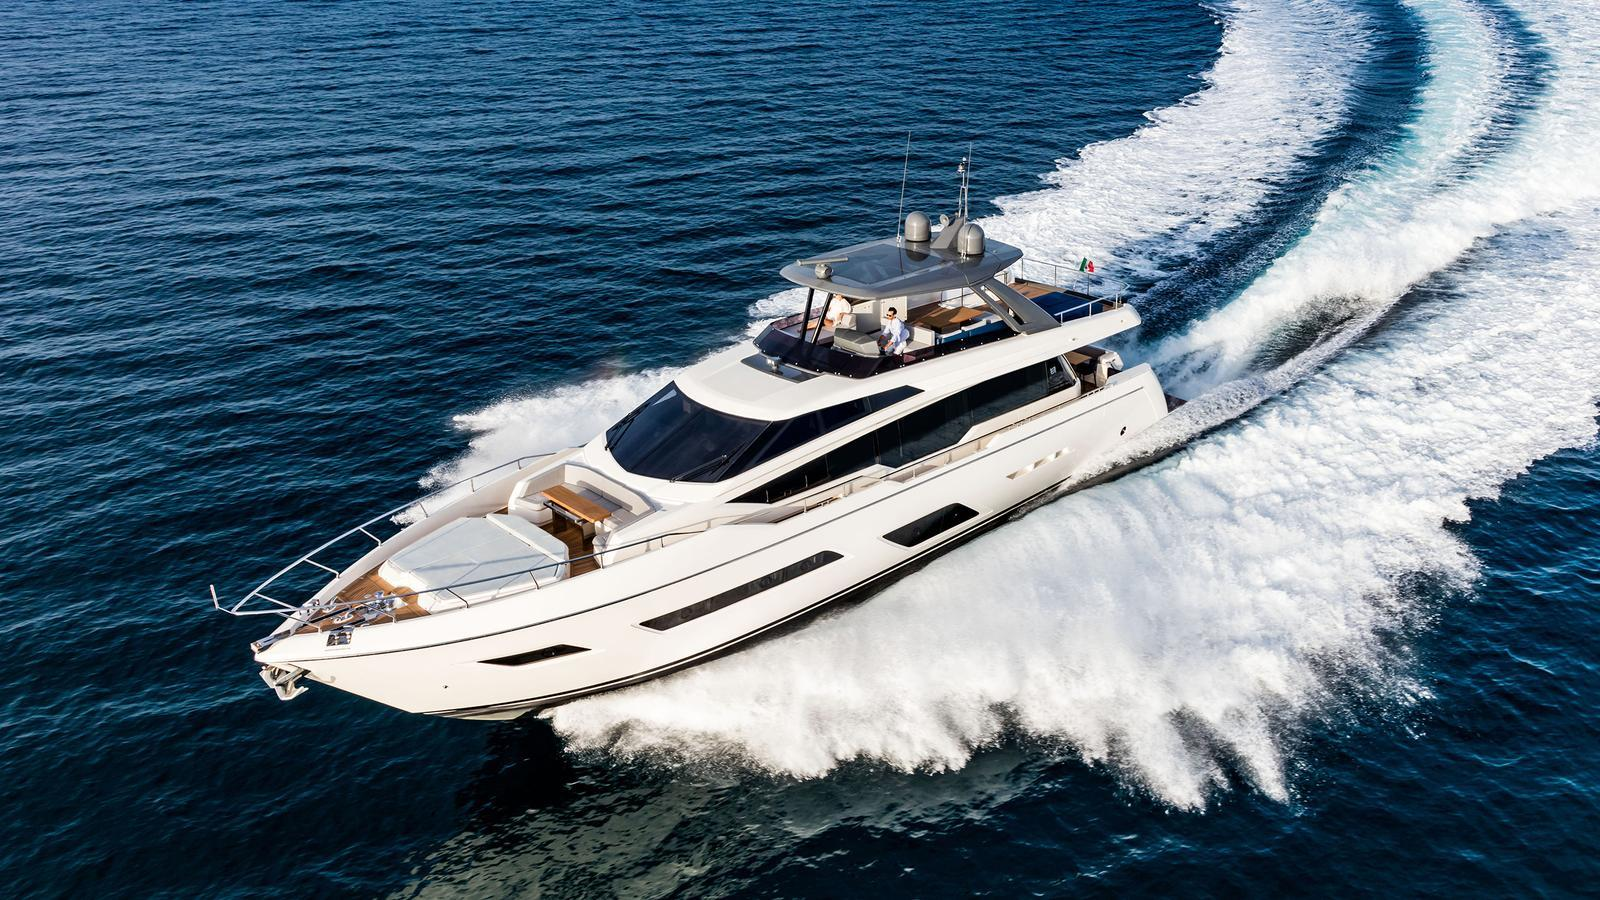 Ferretti 780 motoryacht Ferretti 24m 2018 running shot sistership